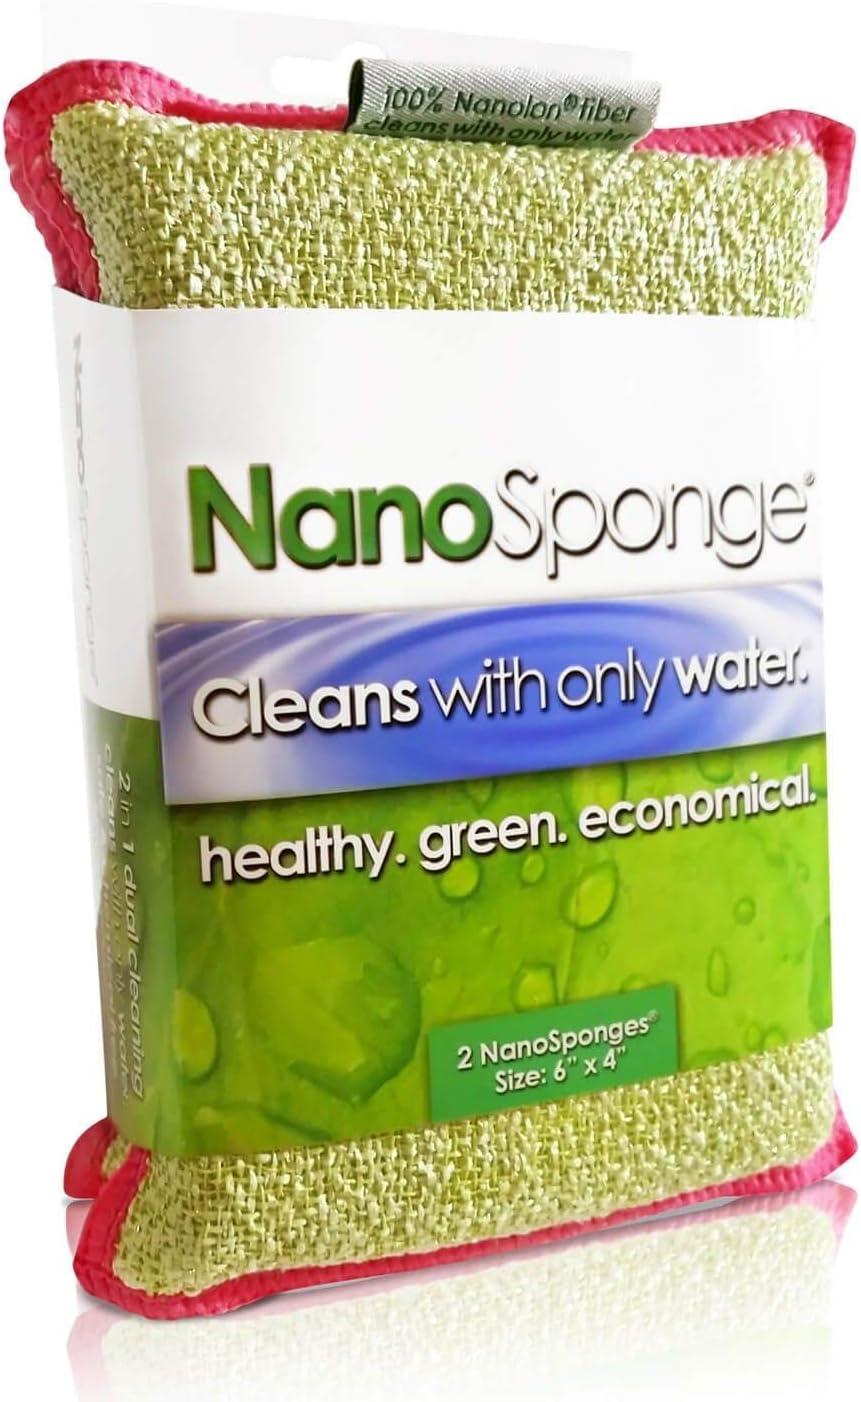 "Nano Sponge Cleaning Sponges   Supersized Everyday Heavy Duty Large Household Kitchen, Dish, Tile, Floor & Baseboard Cleaner Sponge   2 Pack 6 x 4"""